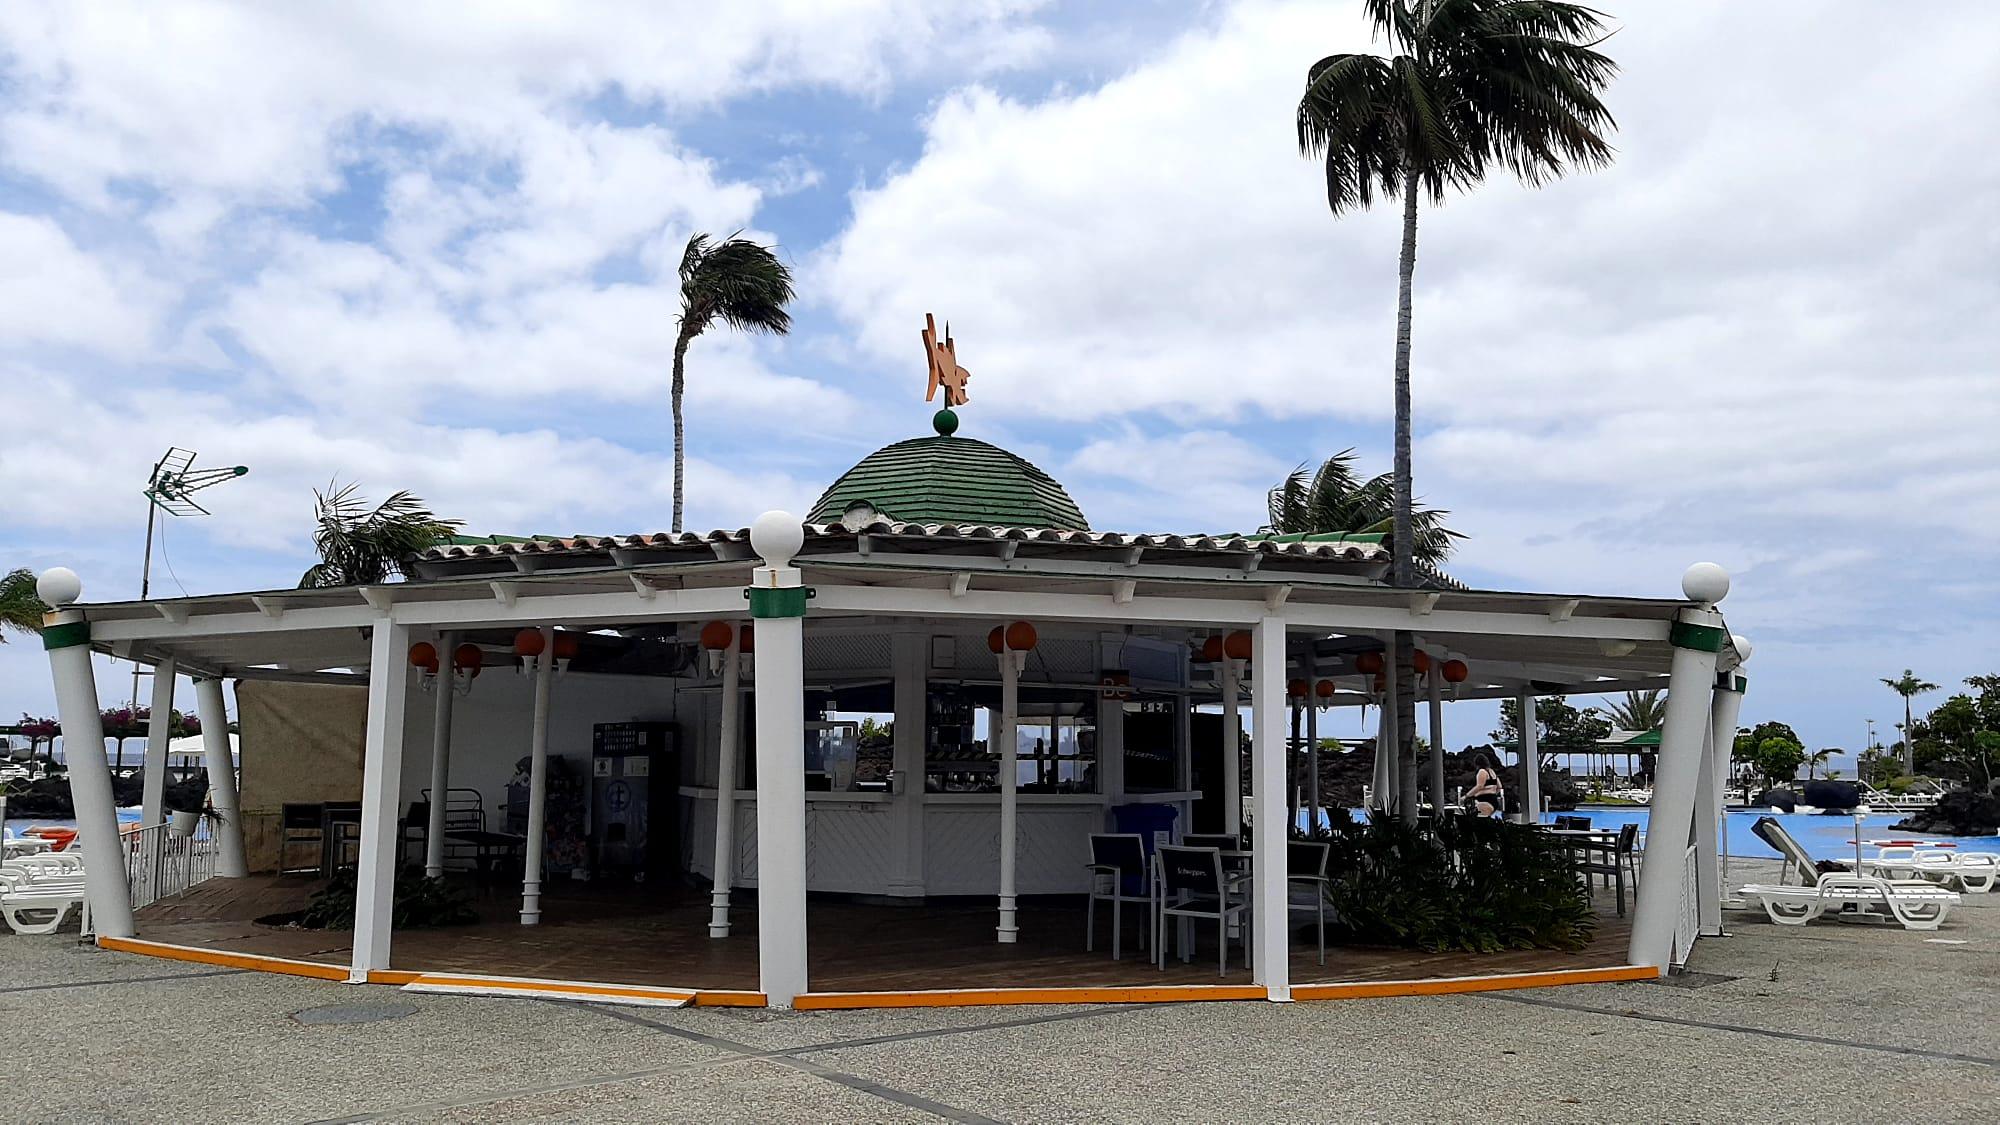 Parque Marítimo César Manrique